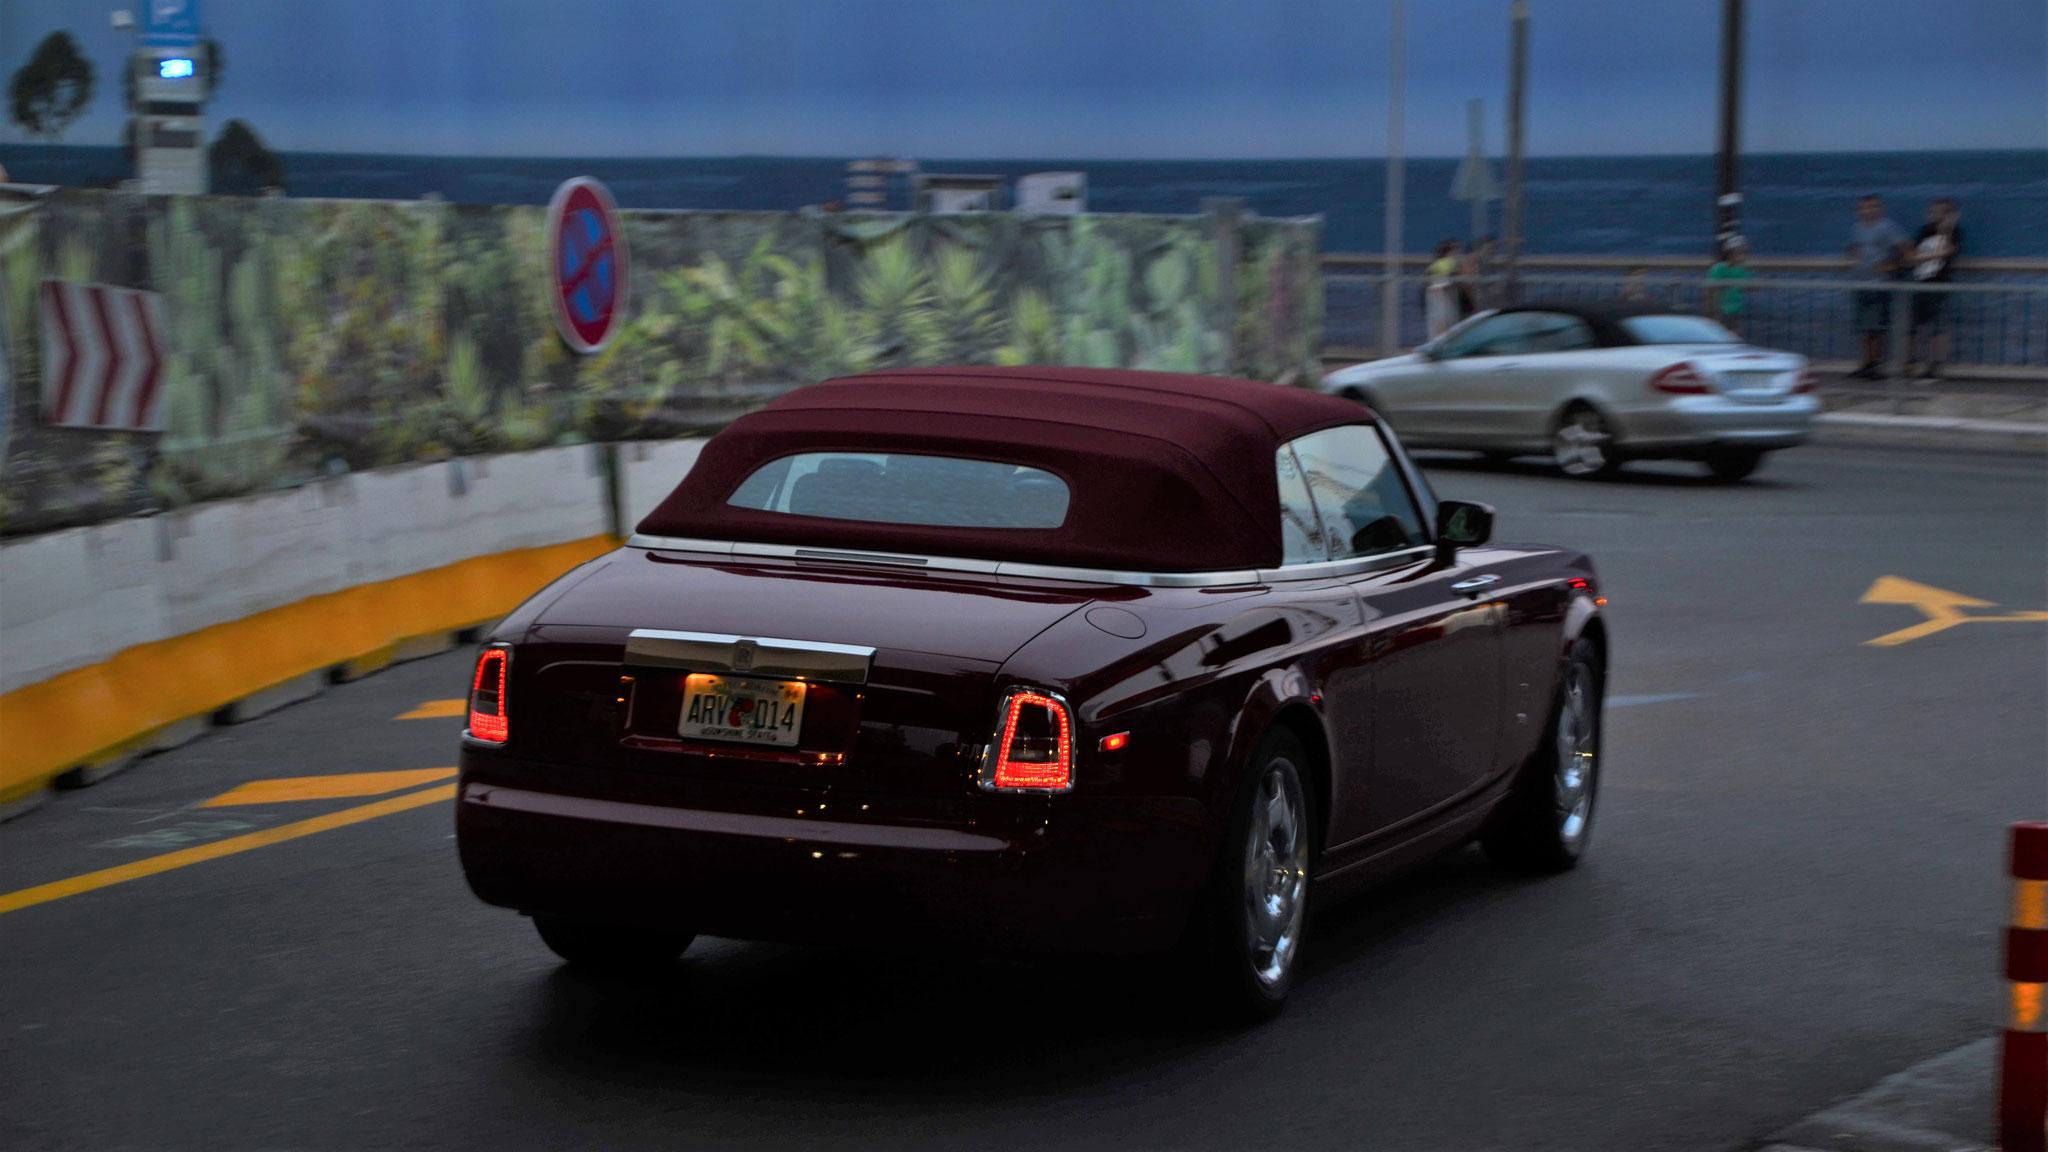 Rolls Royce Drophead - ARV-D14 (USA)